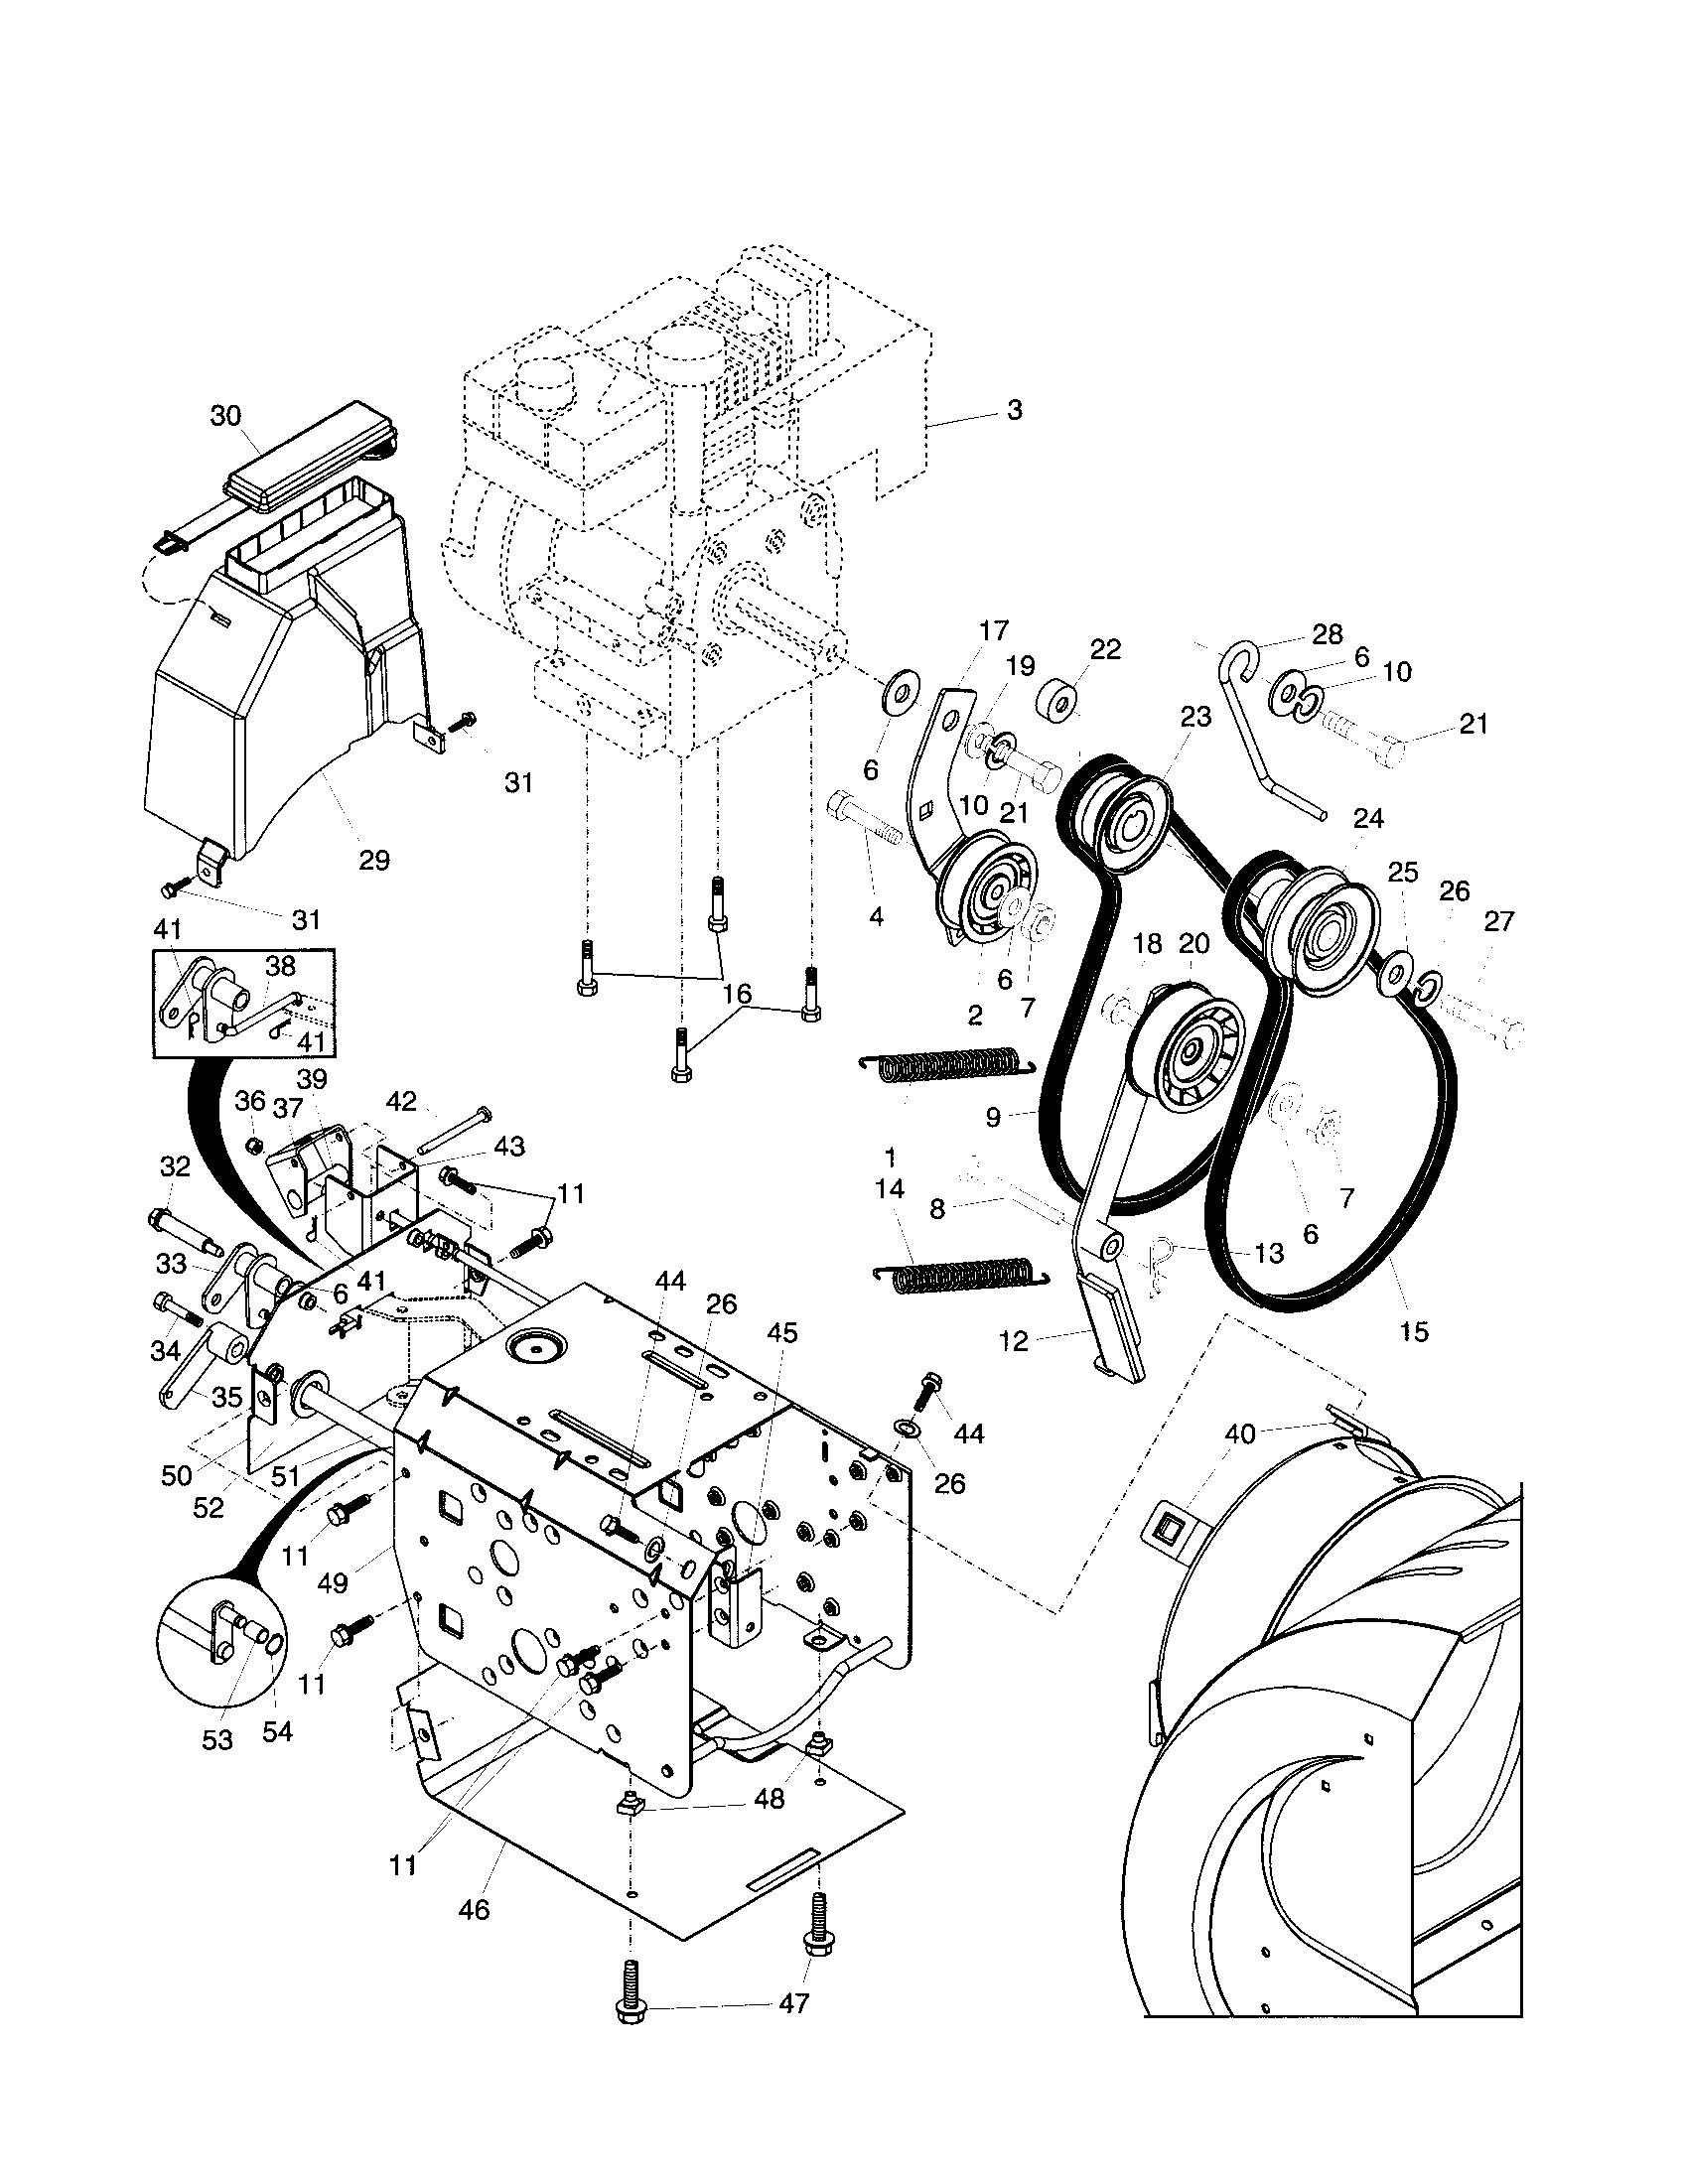 Husqvarna snow thrower parts model 10527ste sears partsdirect rh searspartsdirect